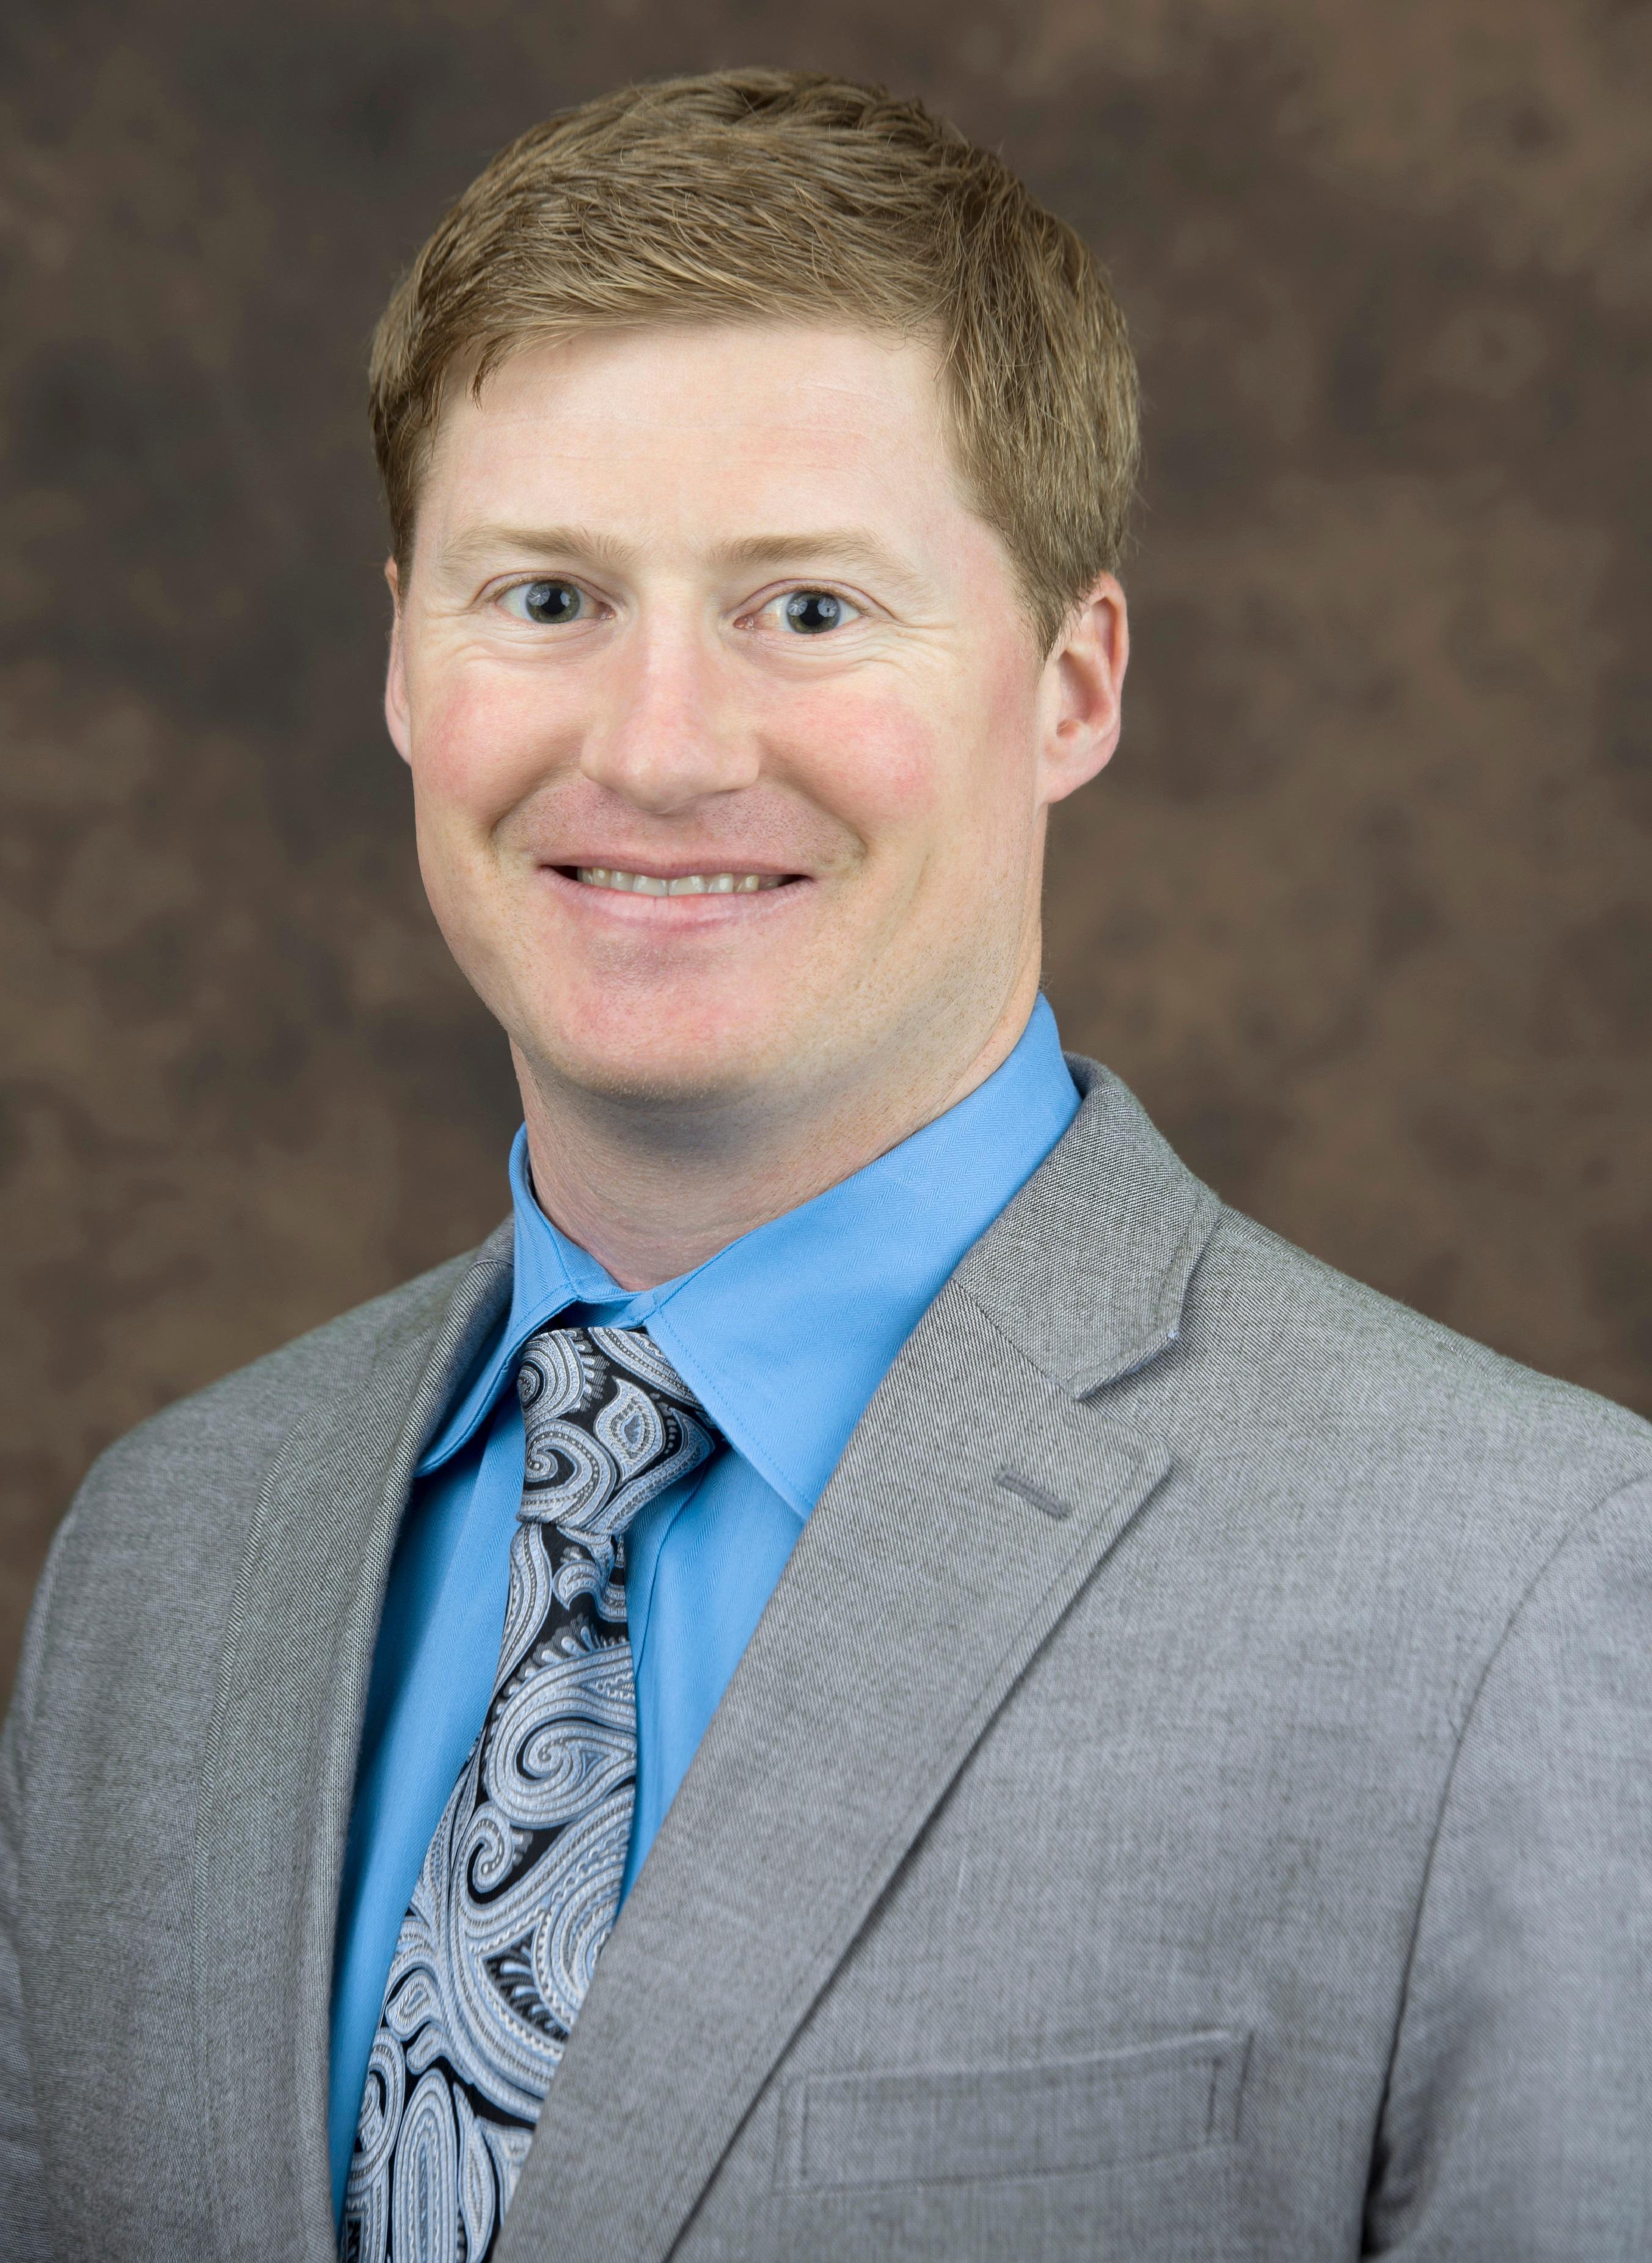 David M. Poore Profile Picture